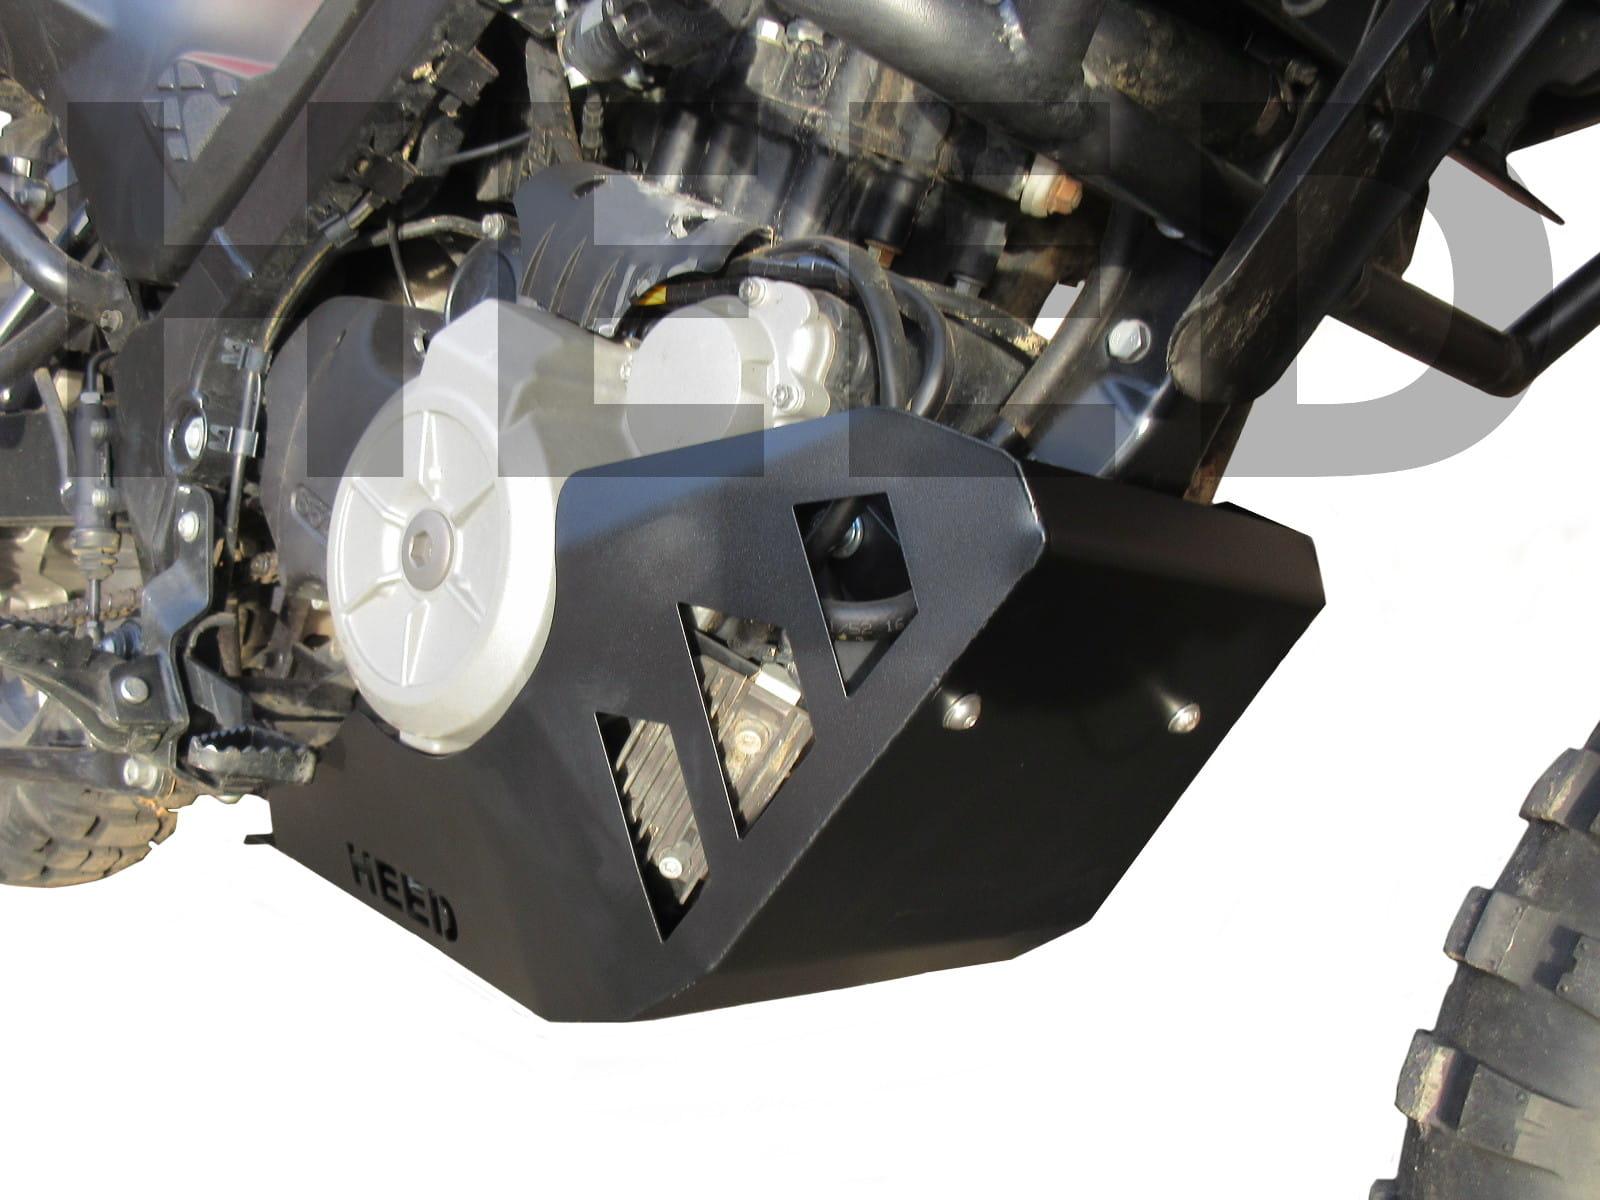 2010-2015 CRASH BARS HEED BMW G 650 GS 2010-2015 + Bags G 650 GS Sertao